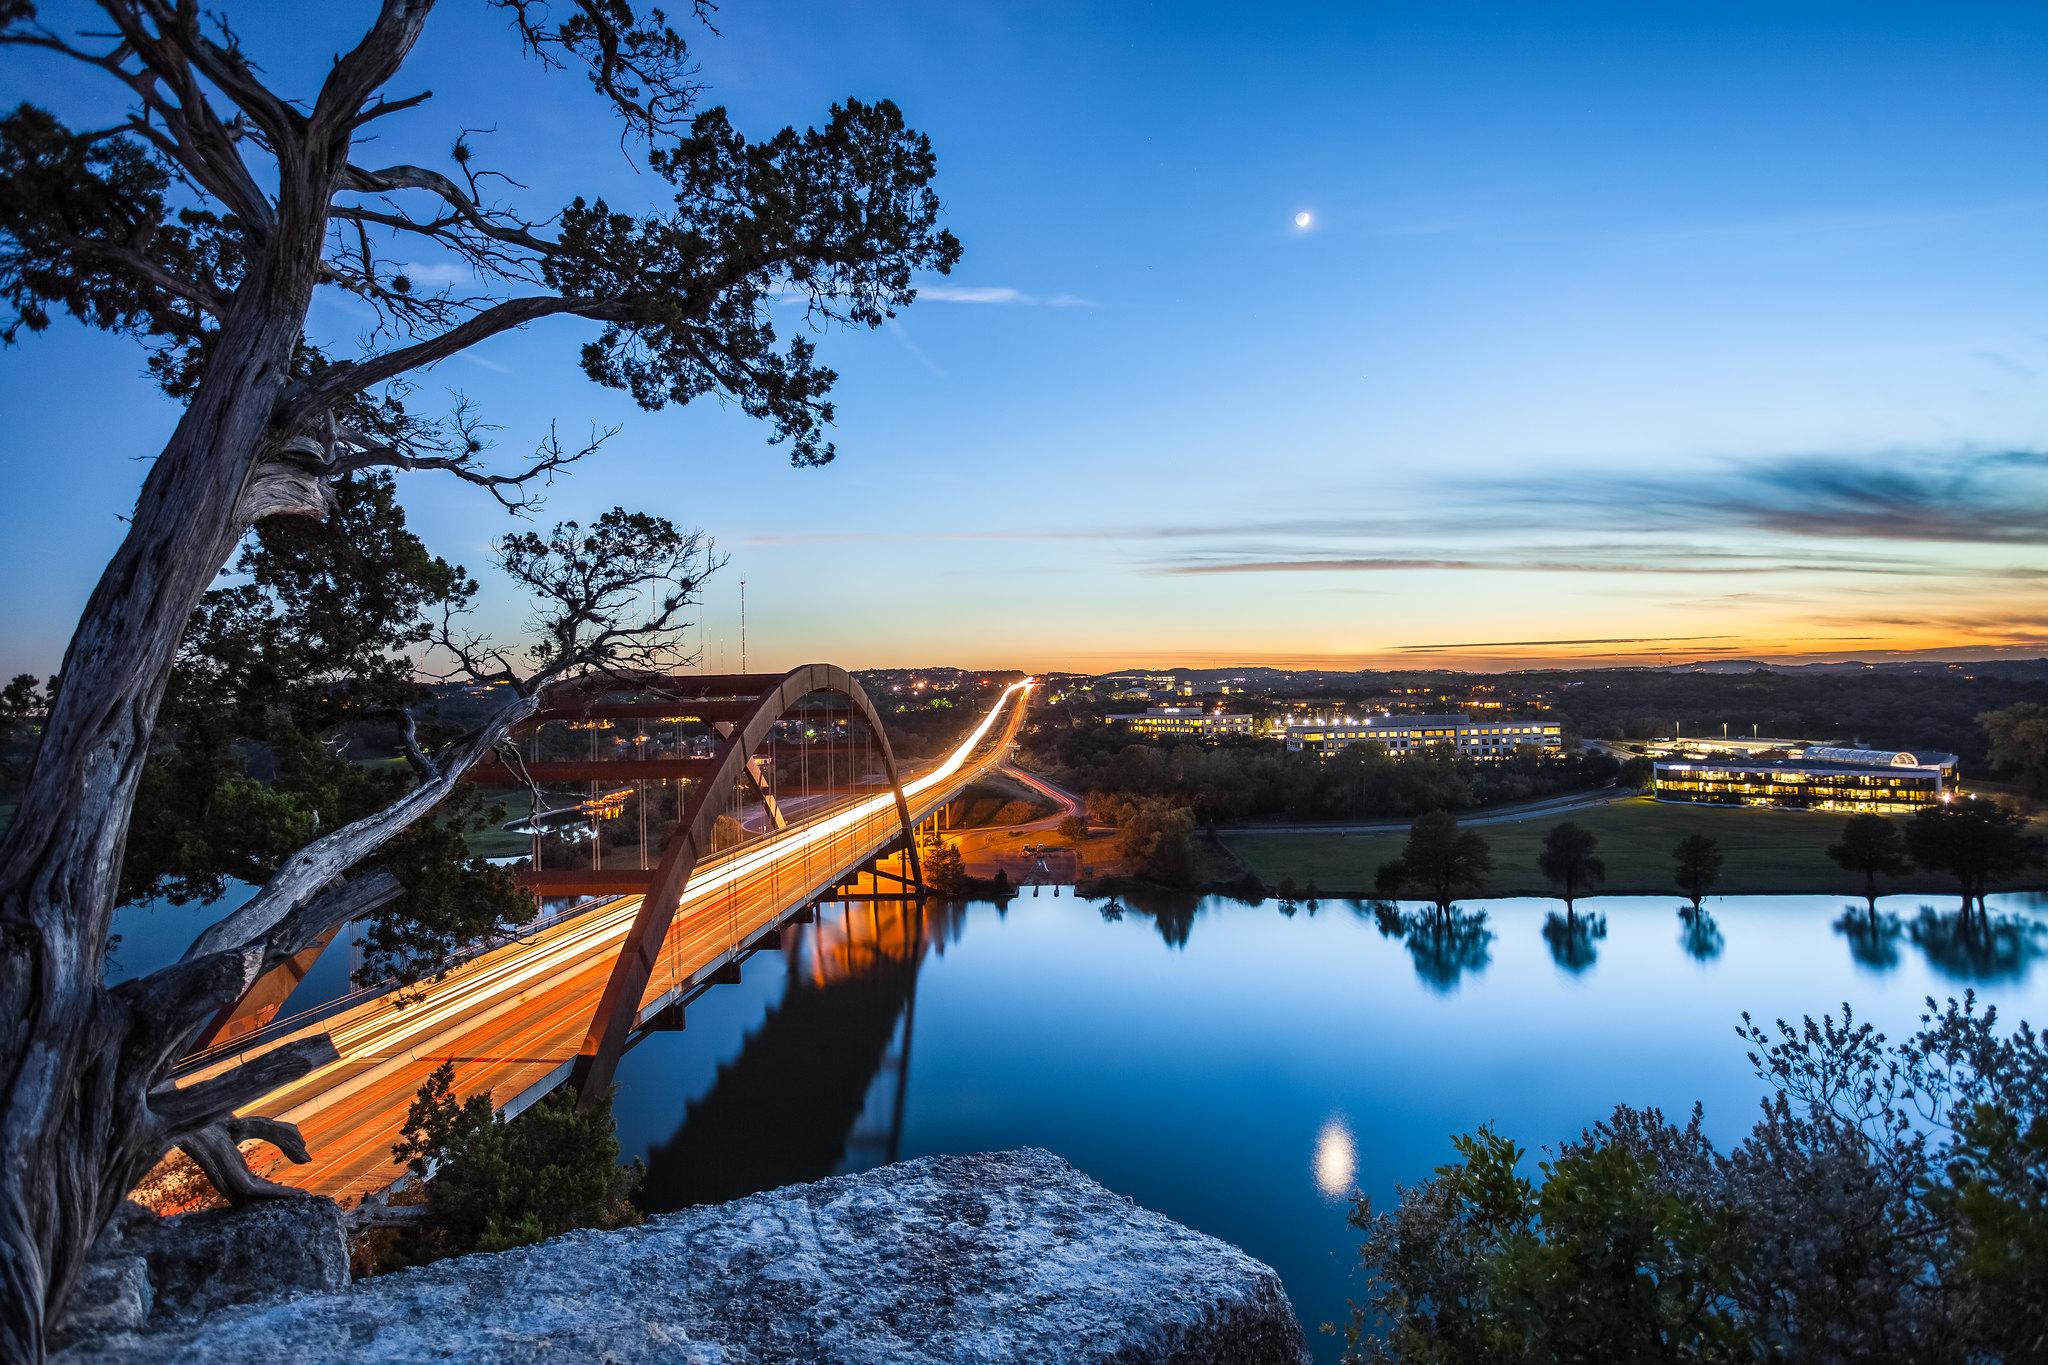 Download Wallpaper 1920x1080 River Sunset Bridge: Pennybacker Bridge Sunset, Austin Texas (OC) [2048x1365